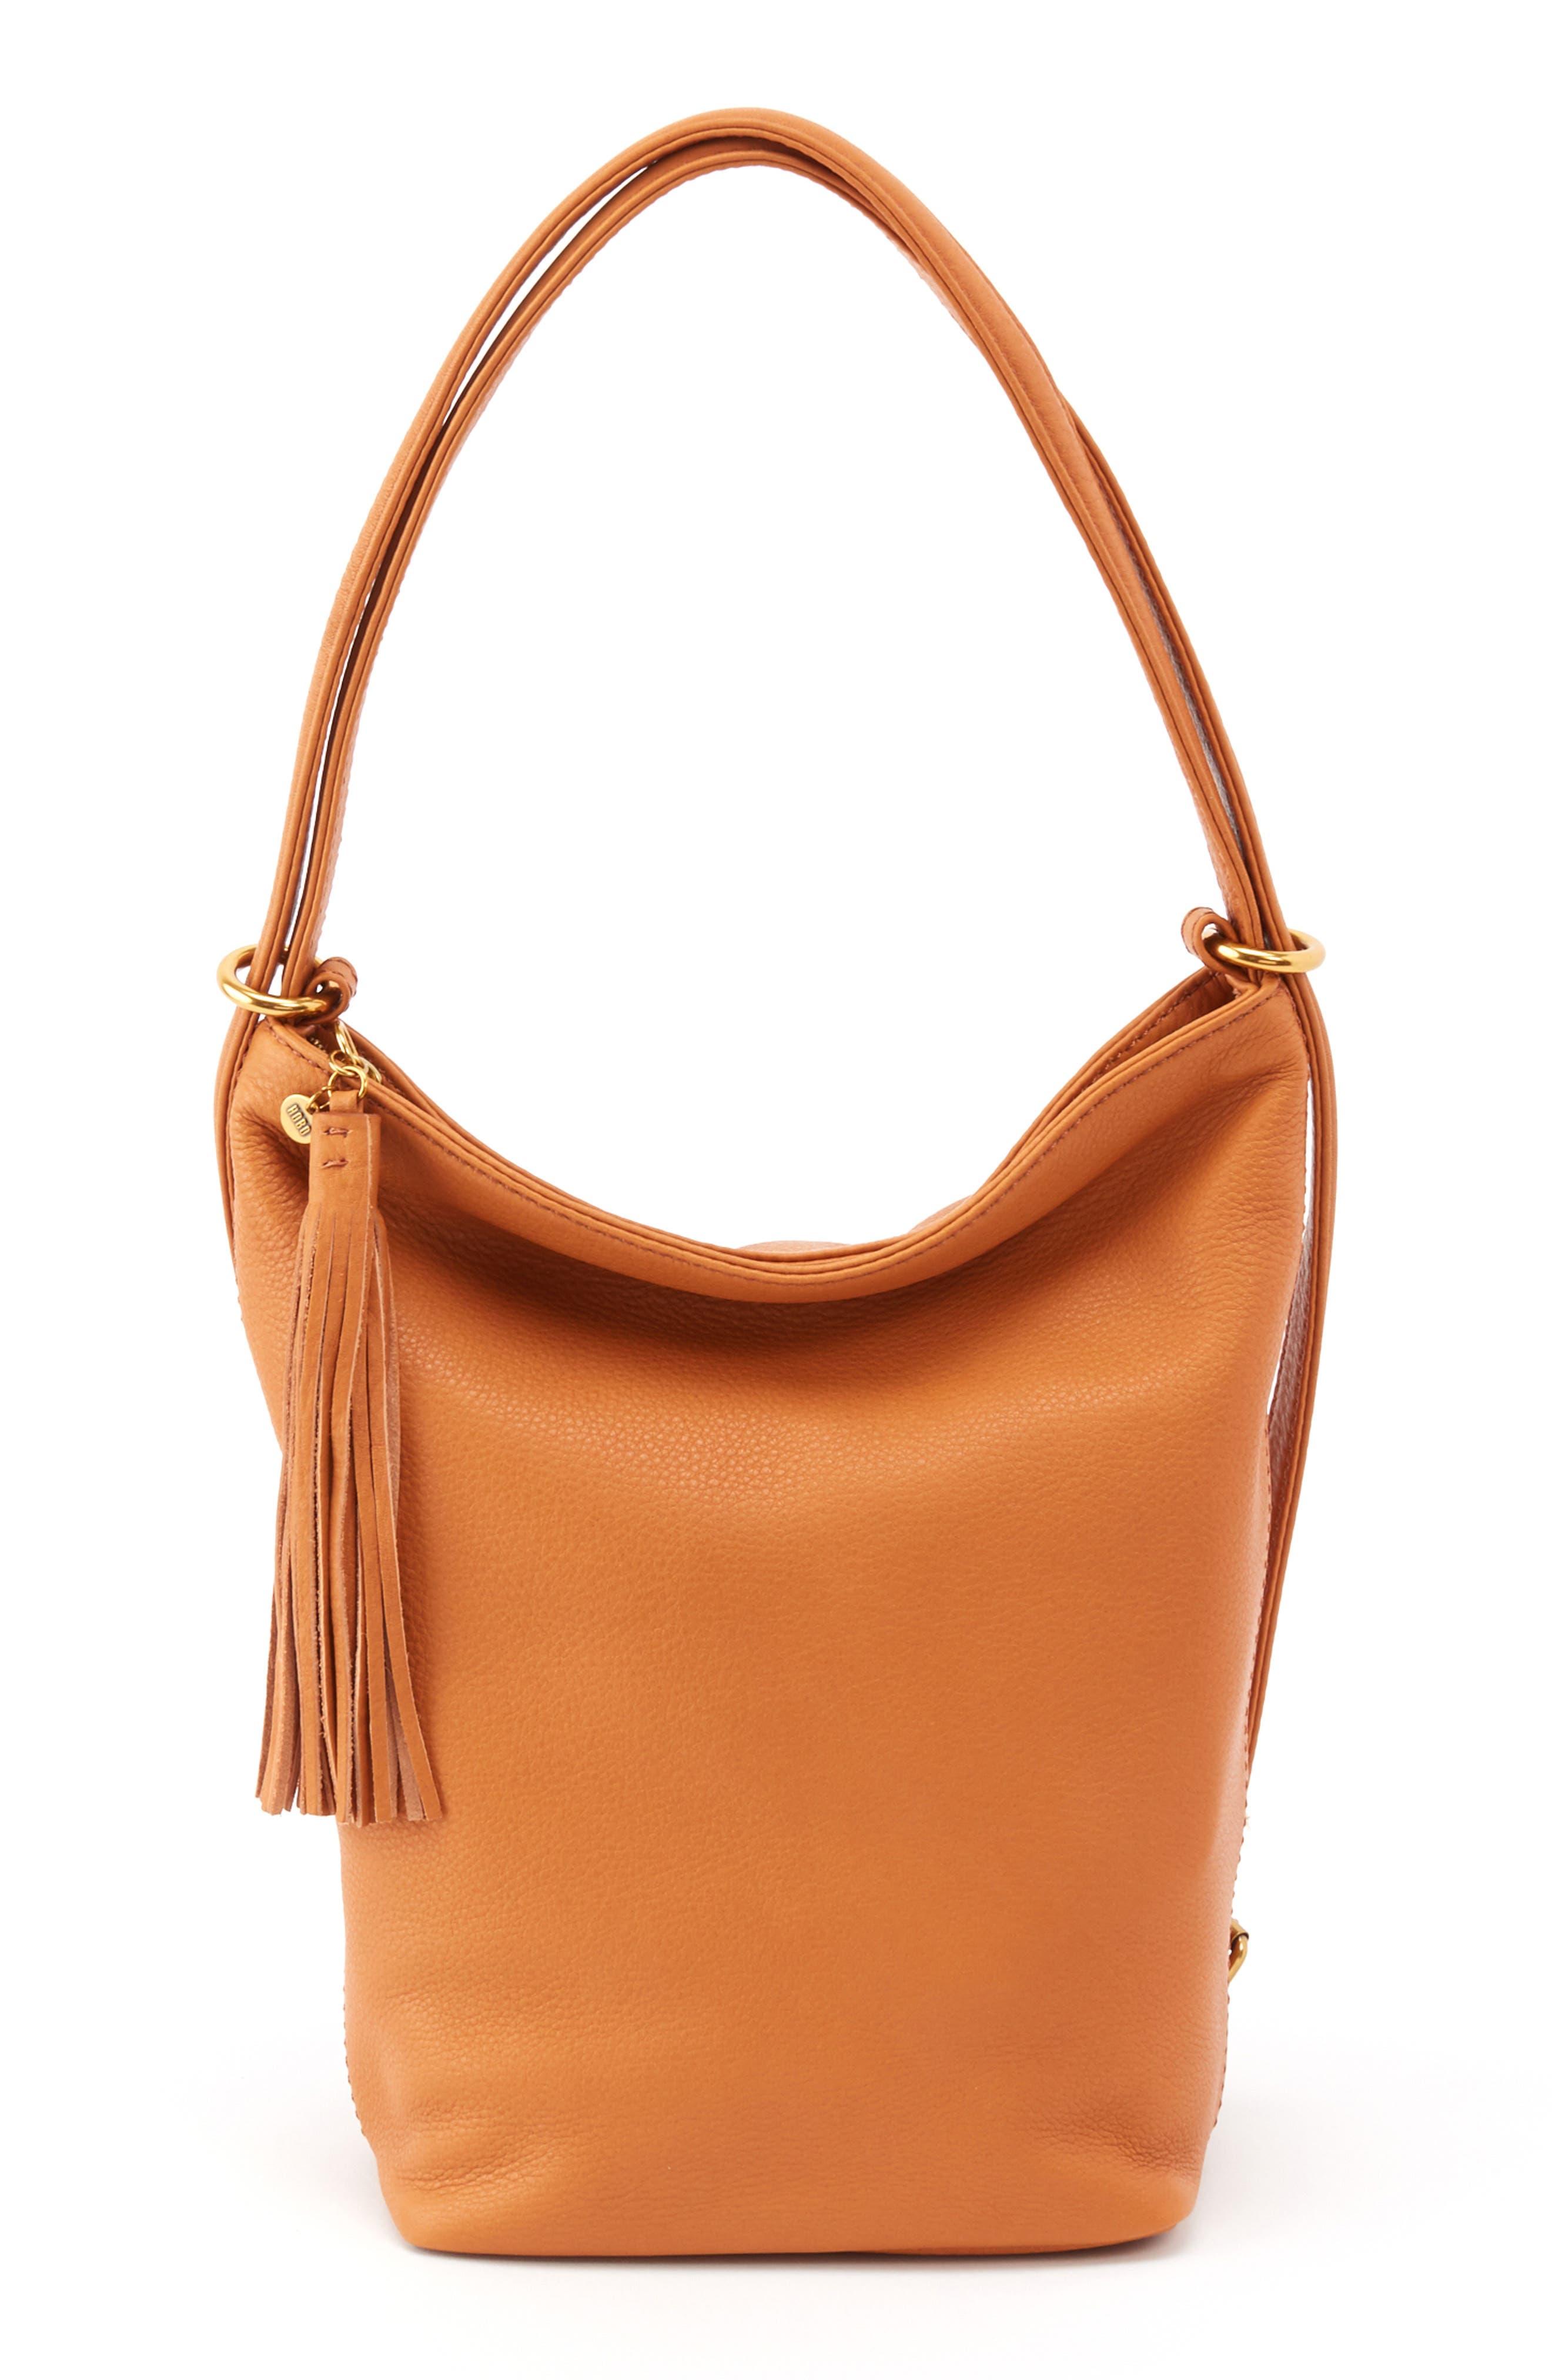 178e93ad6 Hobo Women's Bags